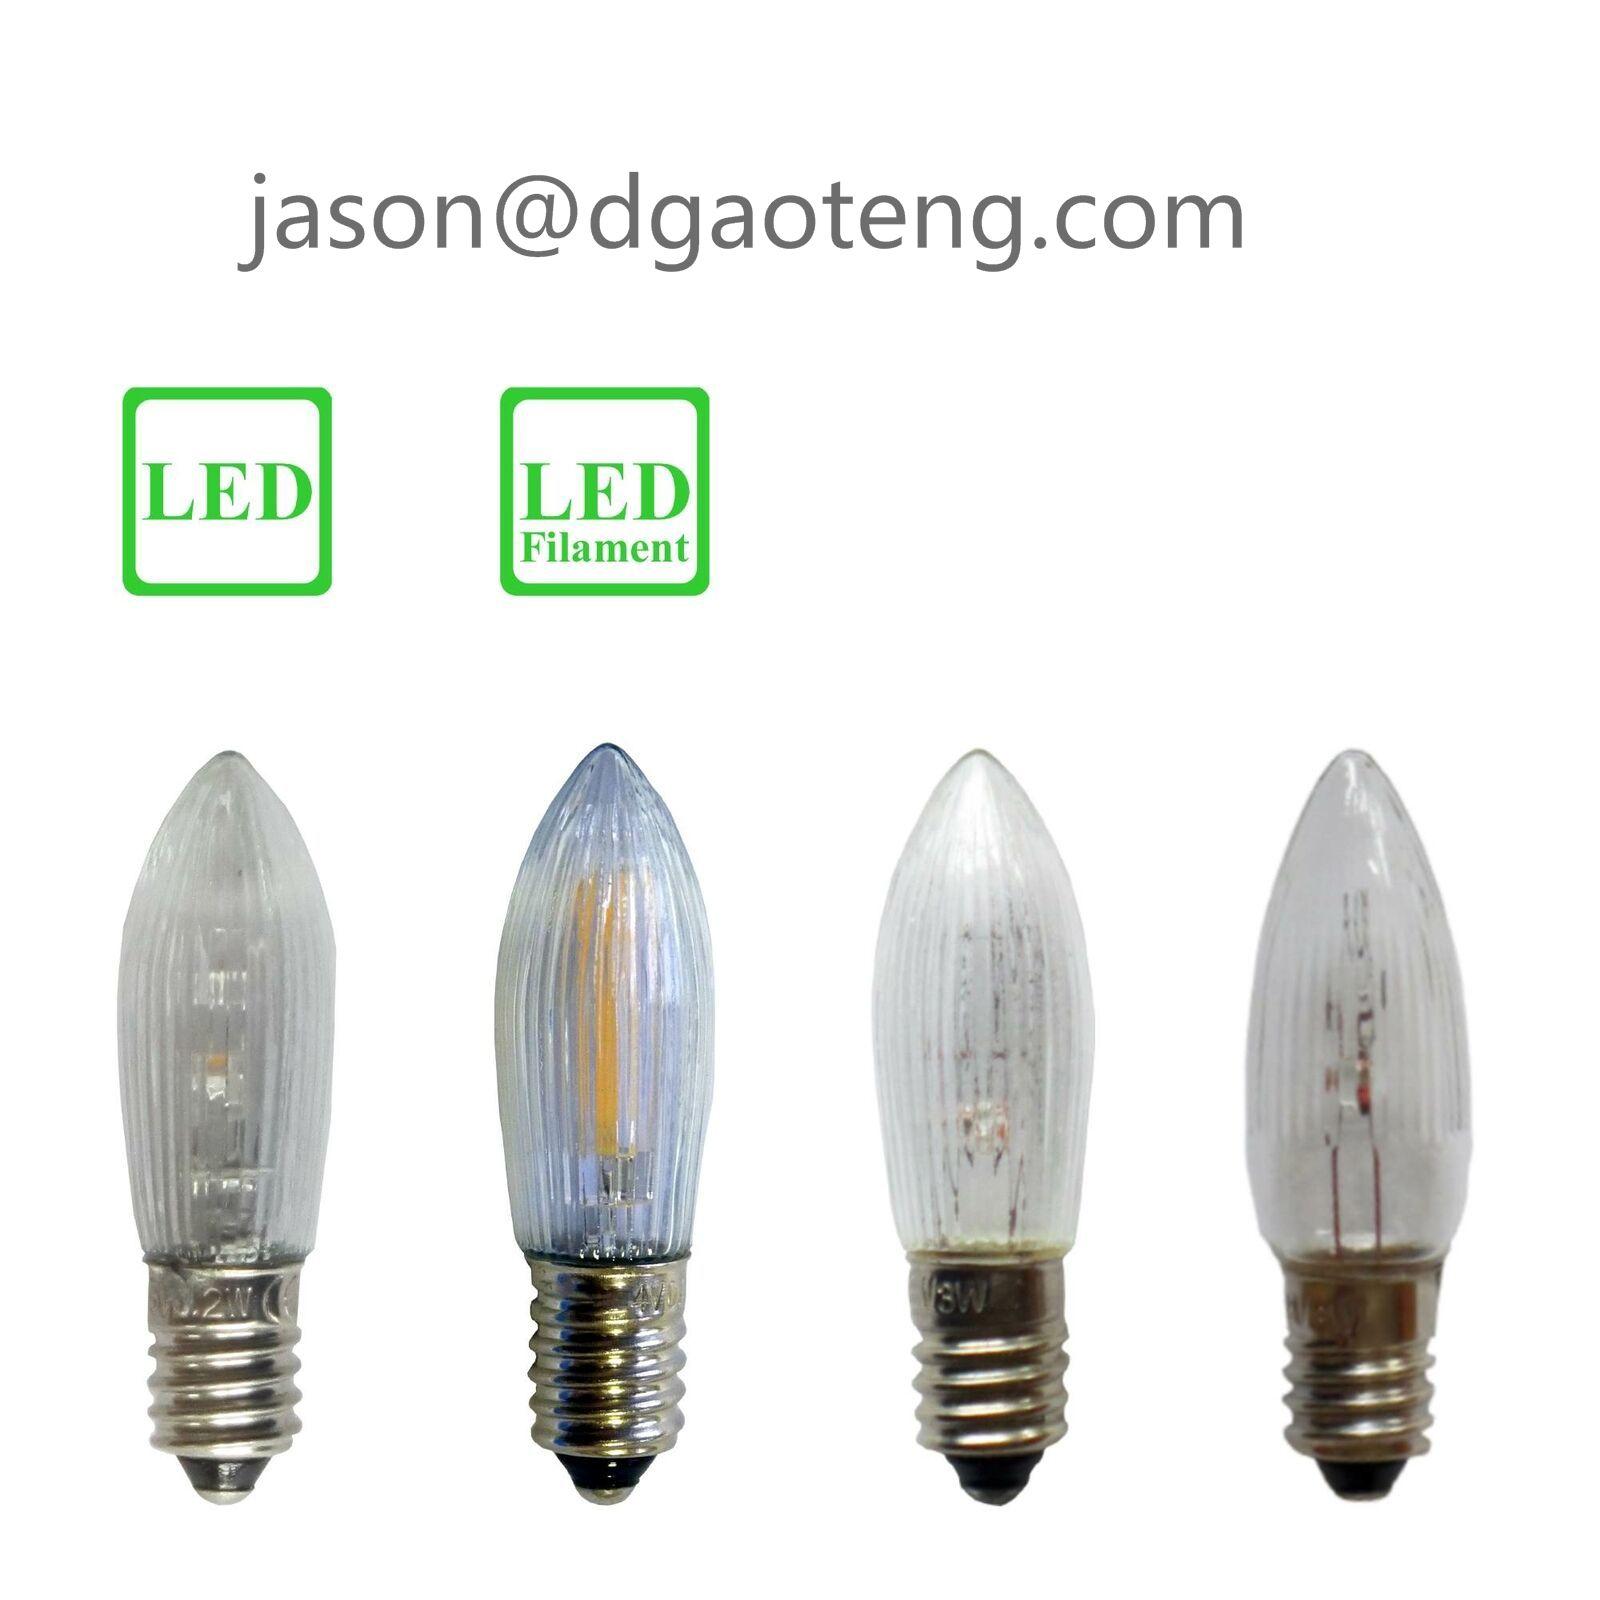 E10 C6 Christmas replacement bulb 12V3W,16V3W,23V3W,34V3W